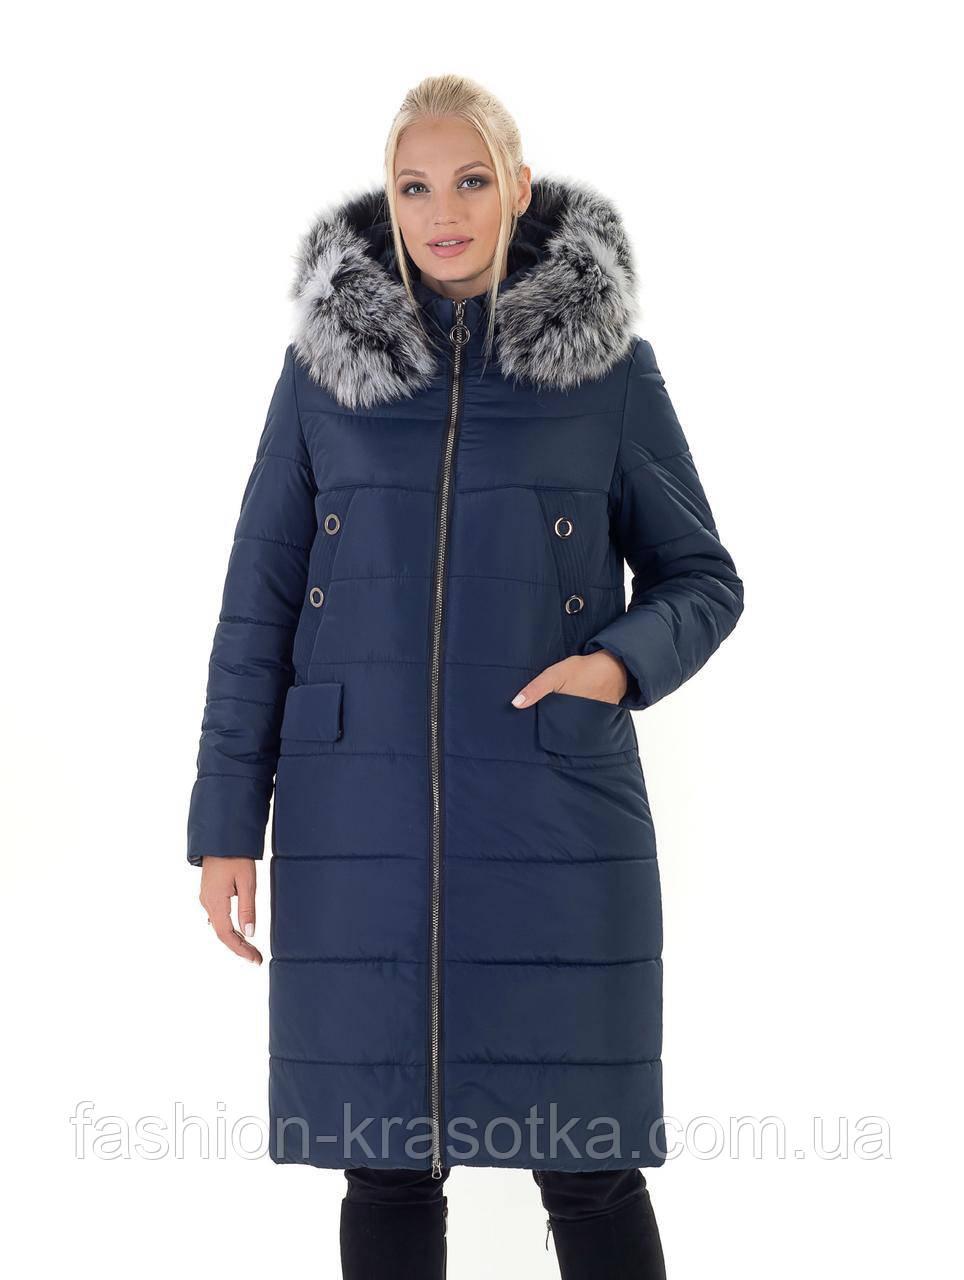 Теплый женский зимний пуховик,размеры:44-60.